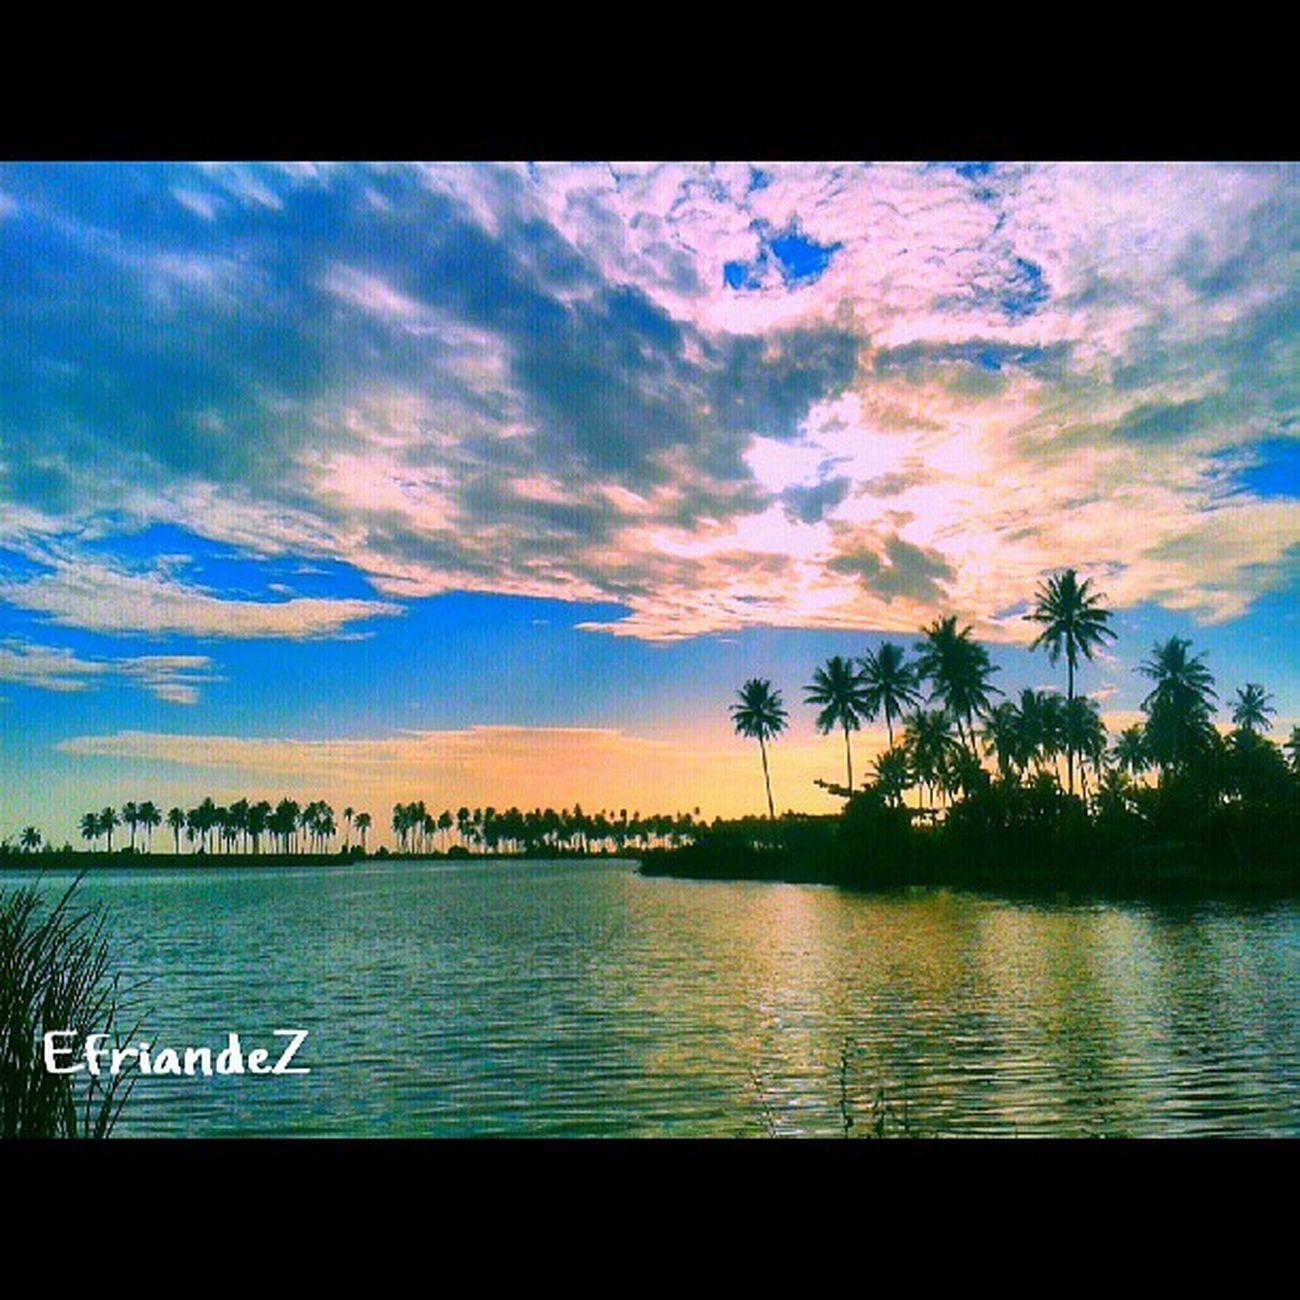 Afternoon sky -------------------------- Skylover HDR_Indonesia Hdrart Padepkankalisurut gf_indonesia mybestshot mybest_sky mybest_nature gf_daily